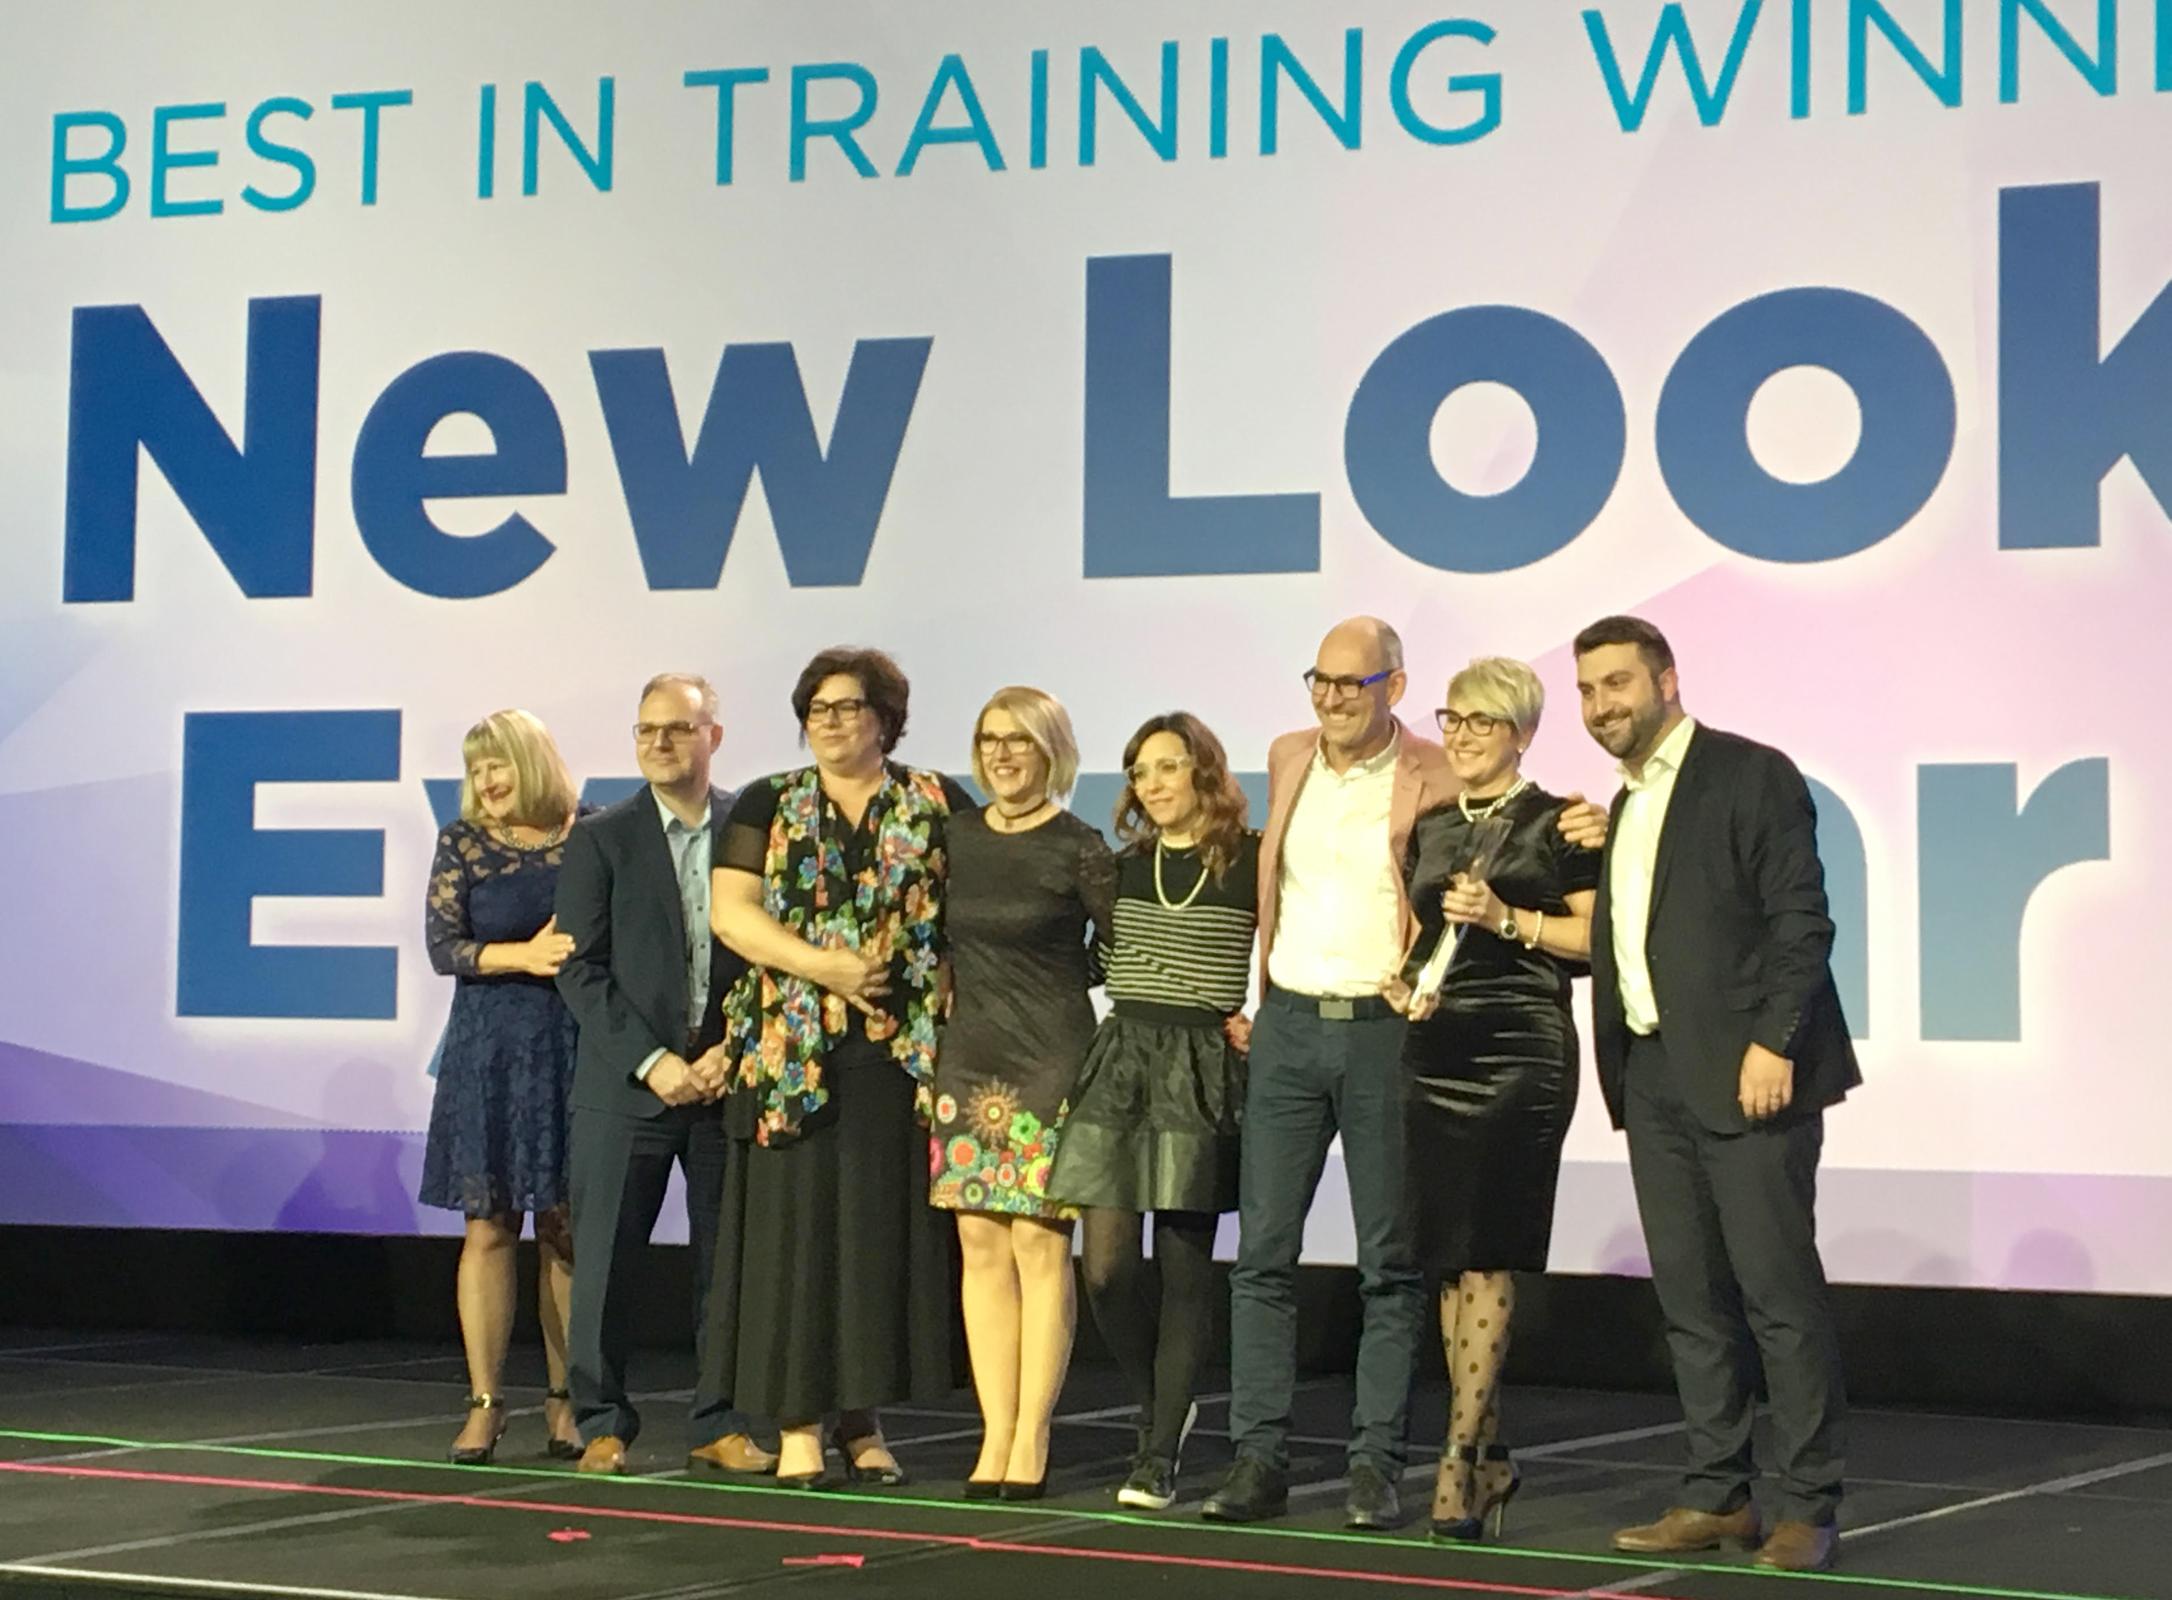 New Look Eyewearnamed 2016 Bestin Training Award winnerat 21st Transitions Academy